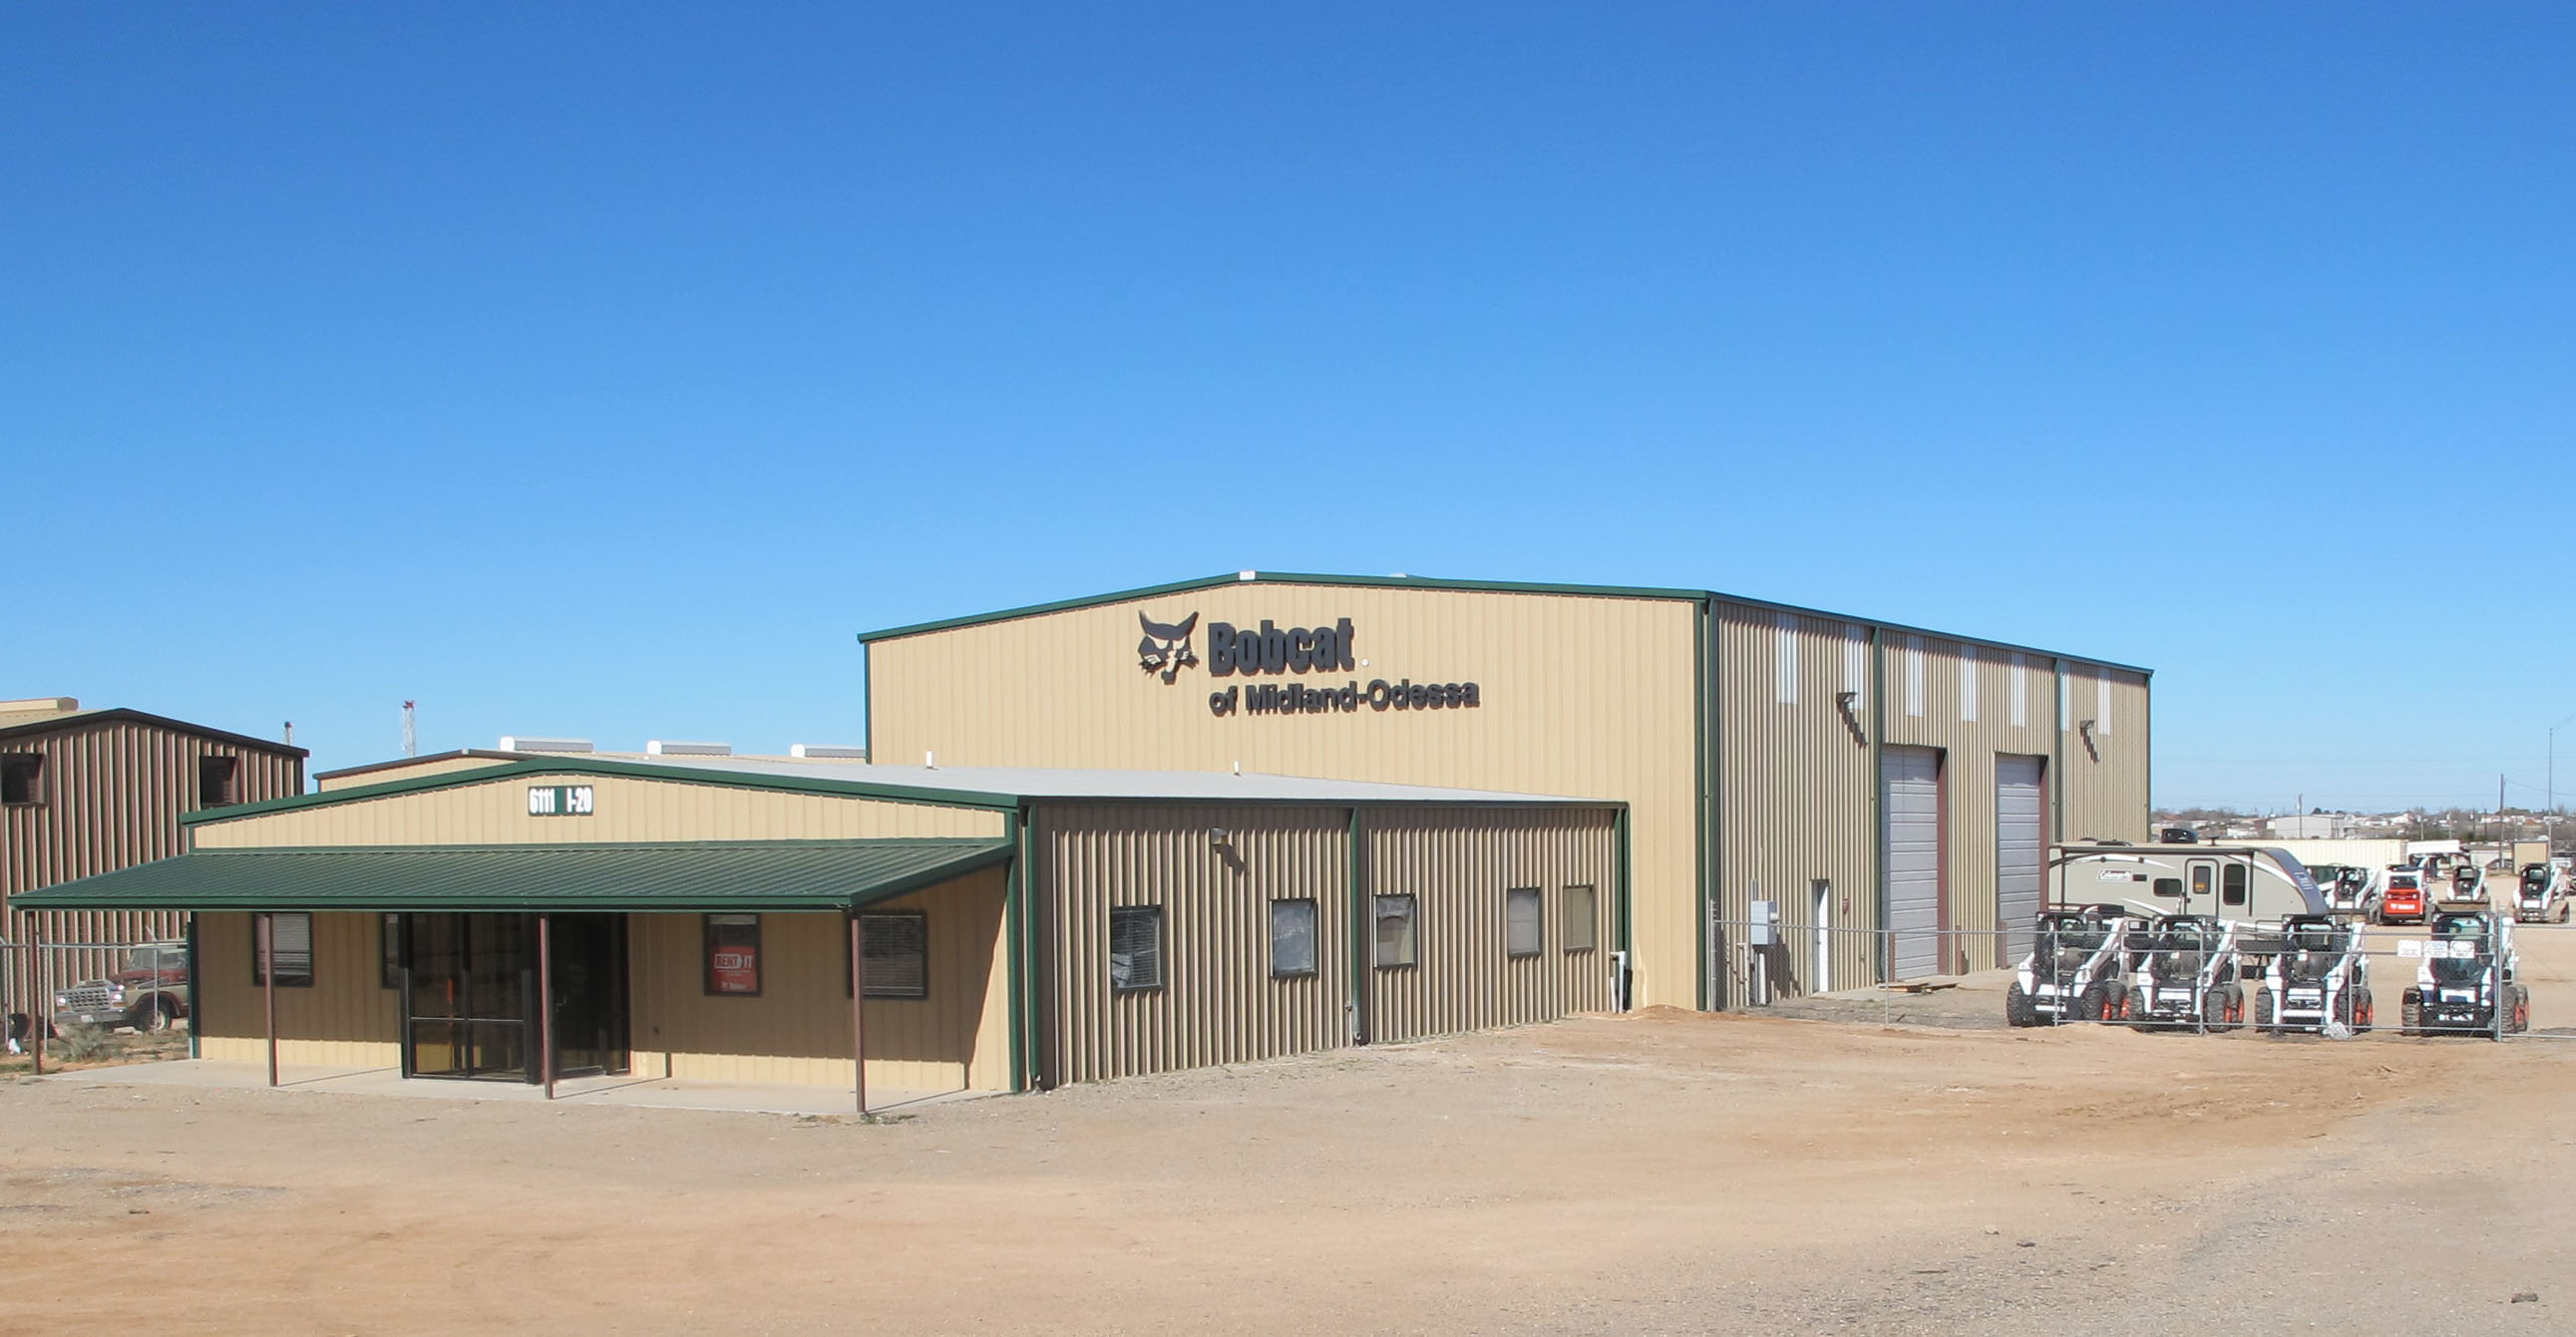 Official Bobcat Equipment Dealer in Midland-Odessa